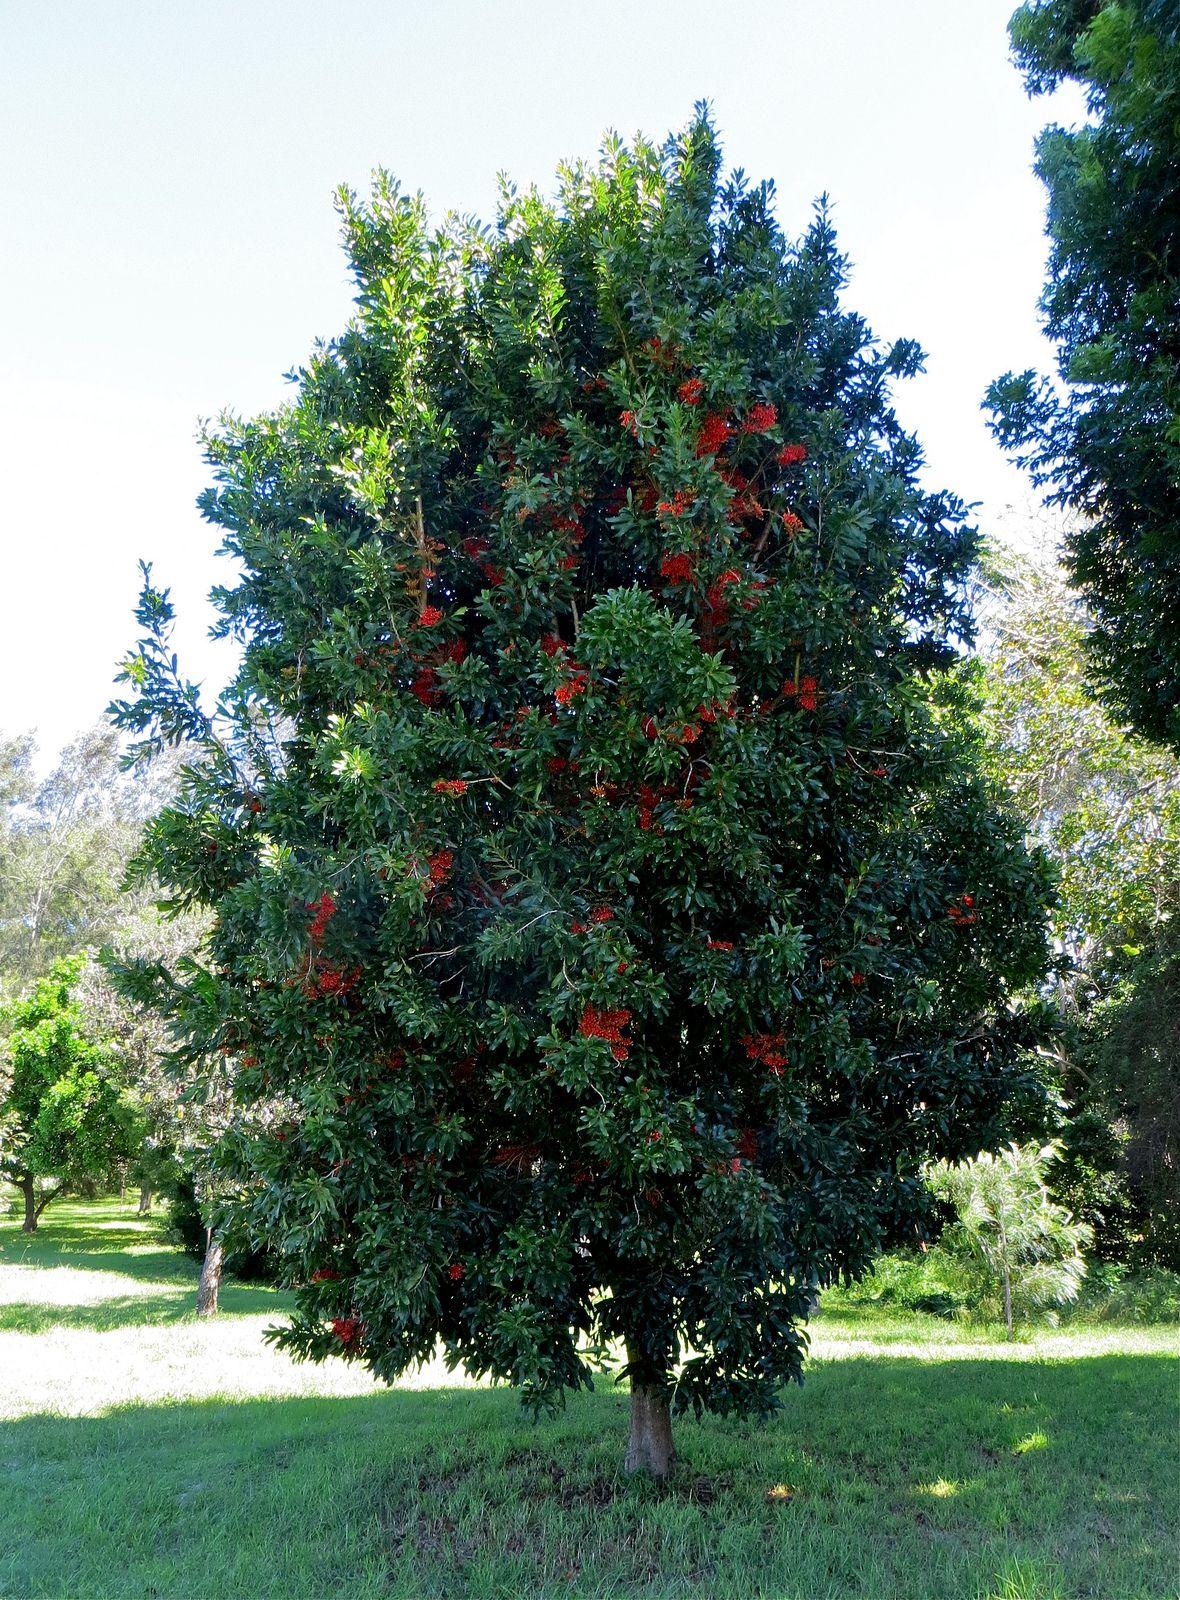 Stenocarpus sinuatus, known as the Firewheel Tree is an ...